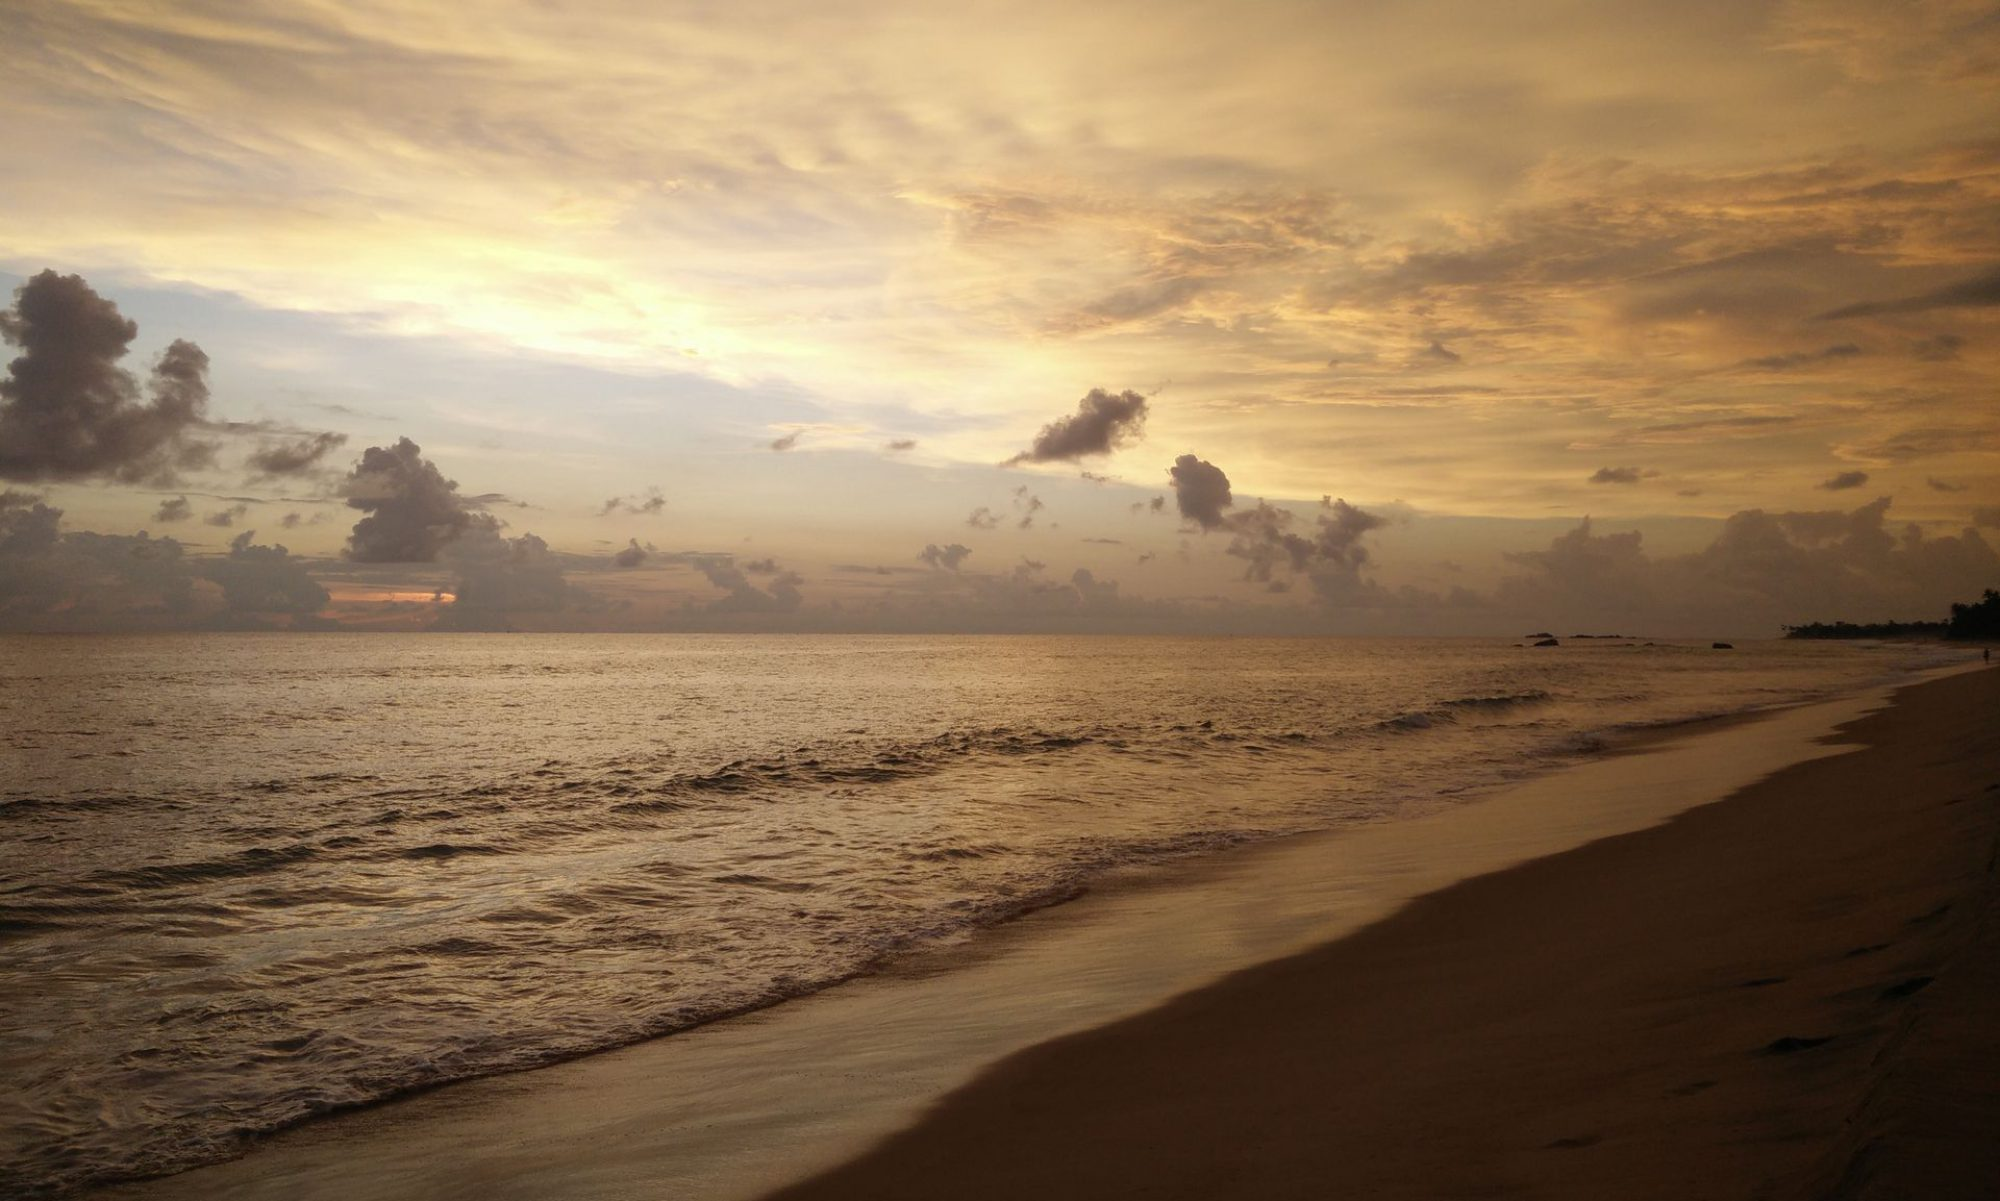 Erlebnisurlaub in Sri Lanka